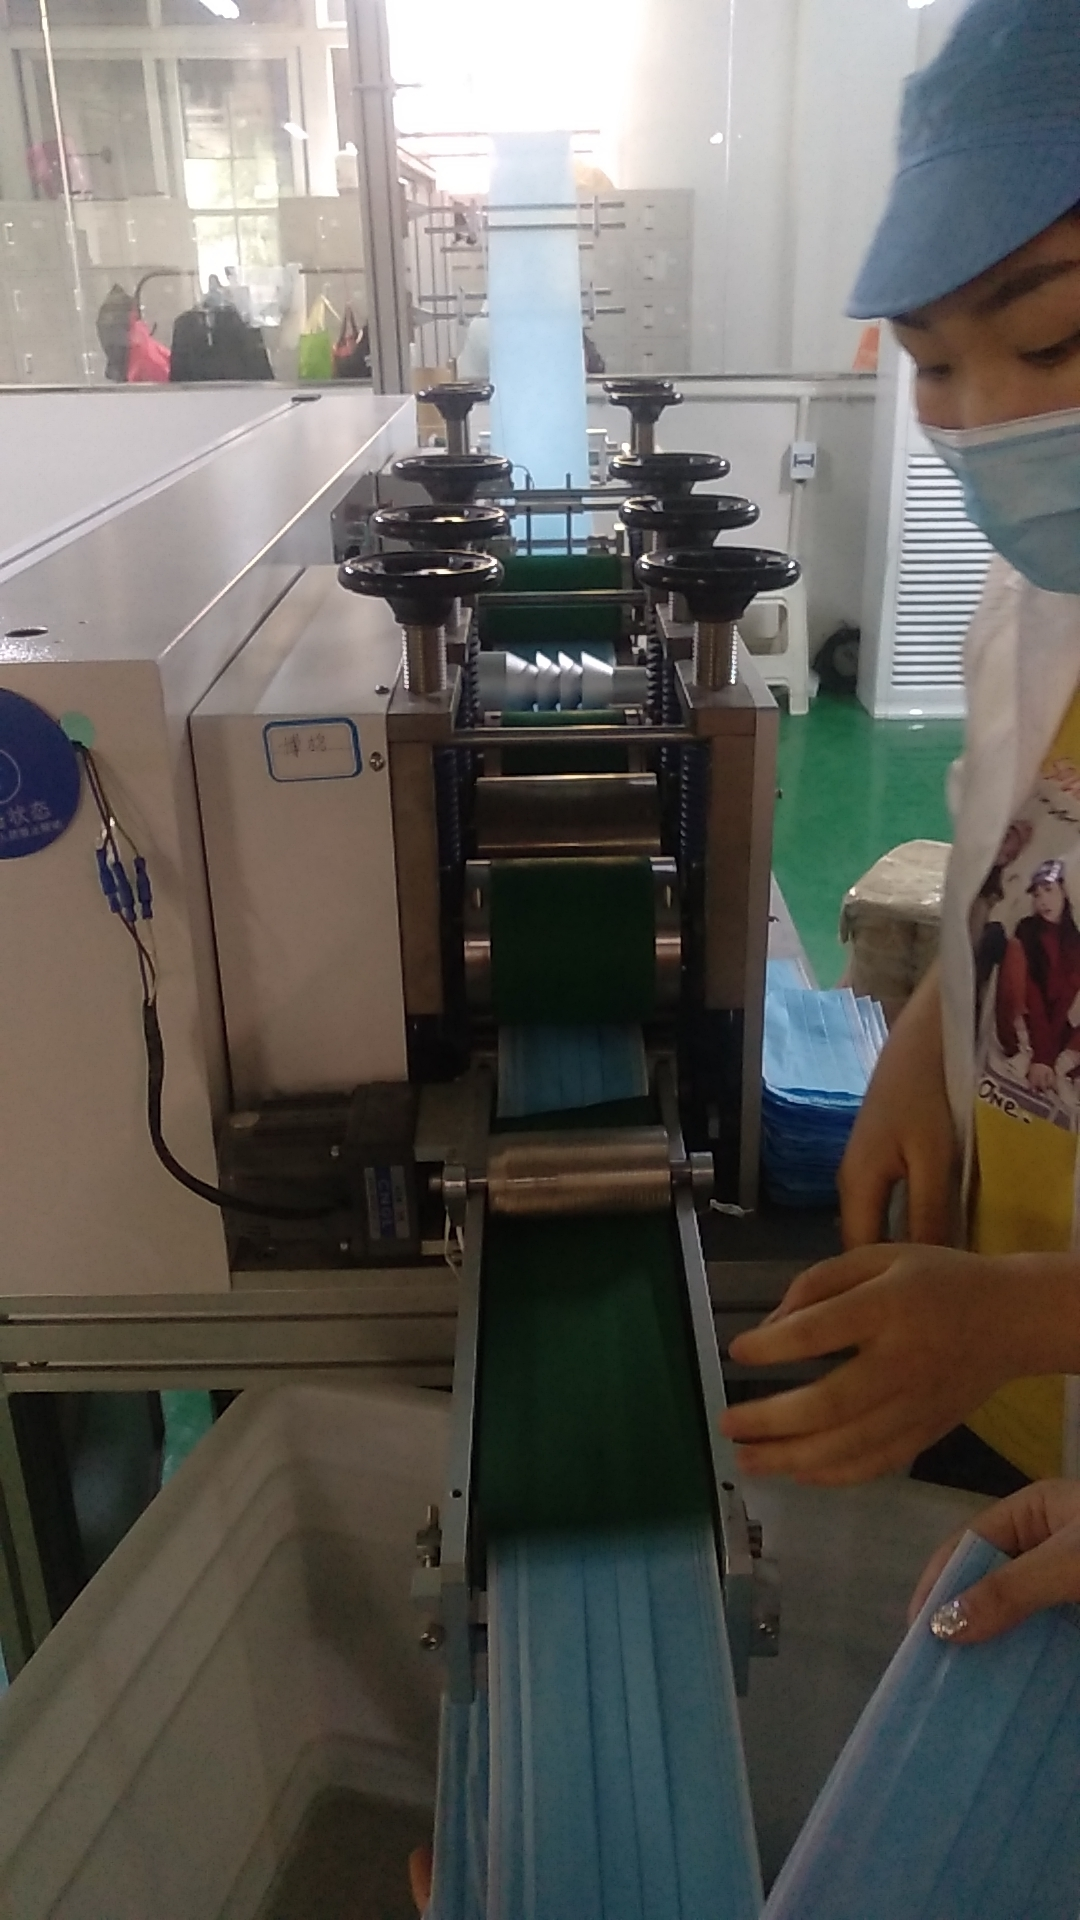 20khz 2000w Ultrasonic Welding Generator And Welding Transducer For Welding Masks